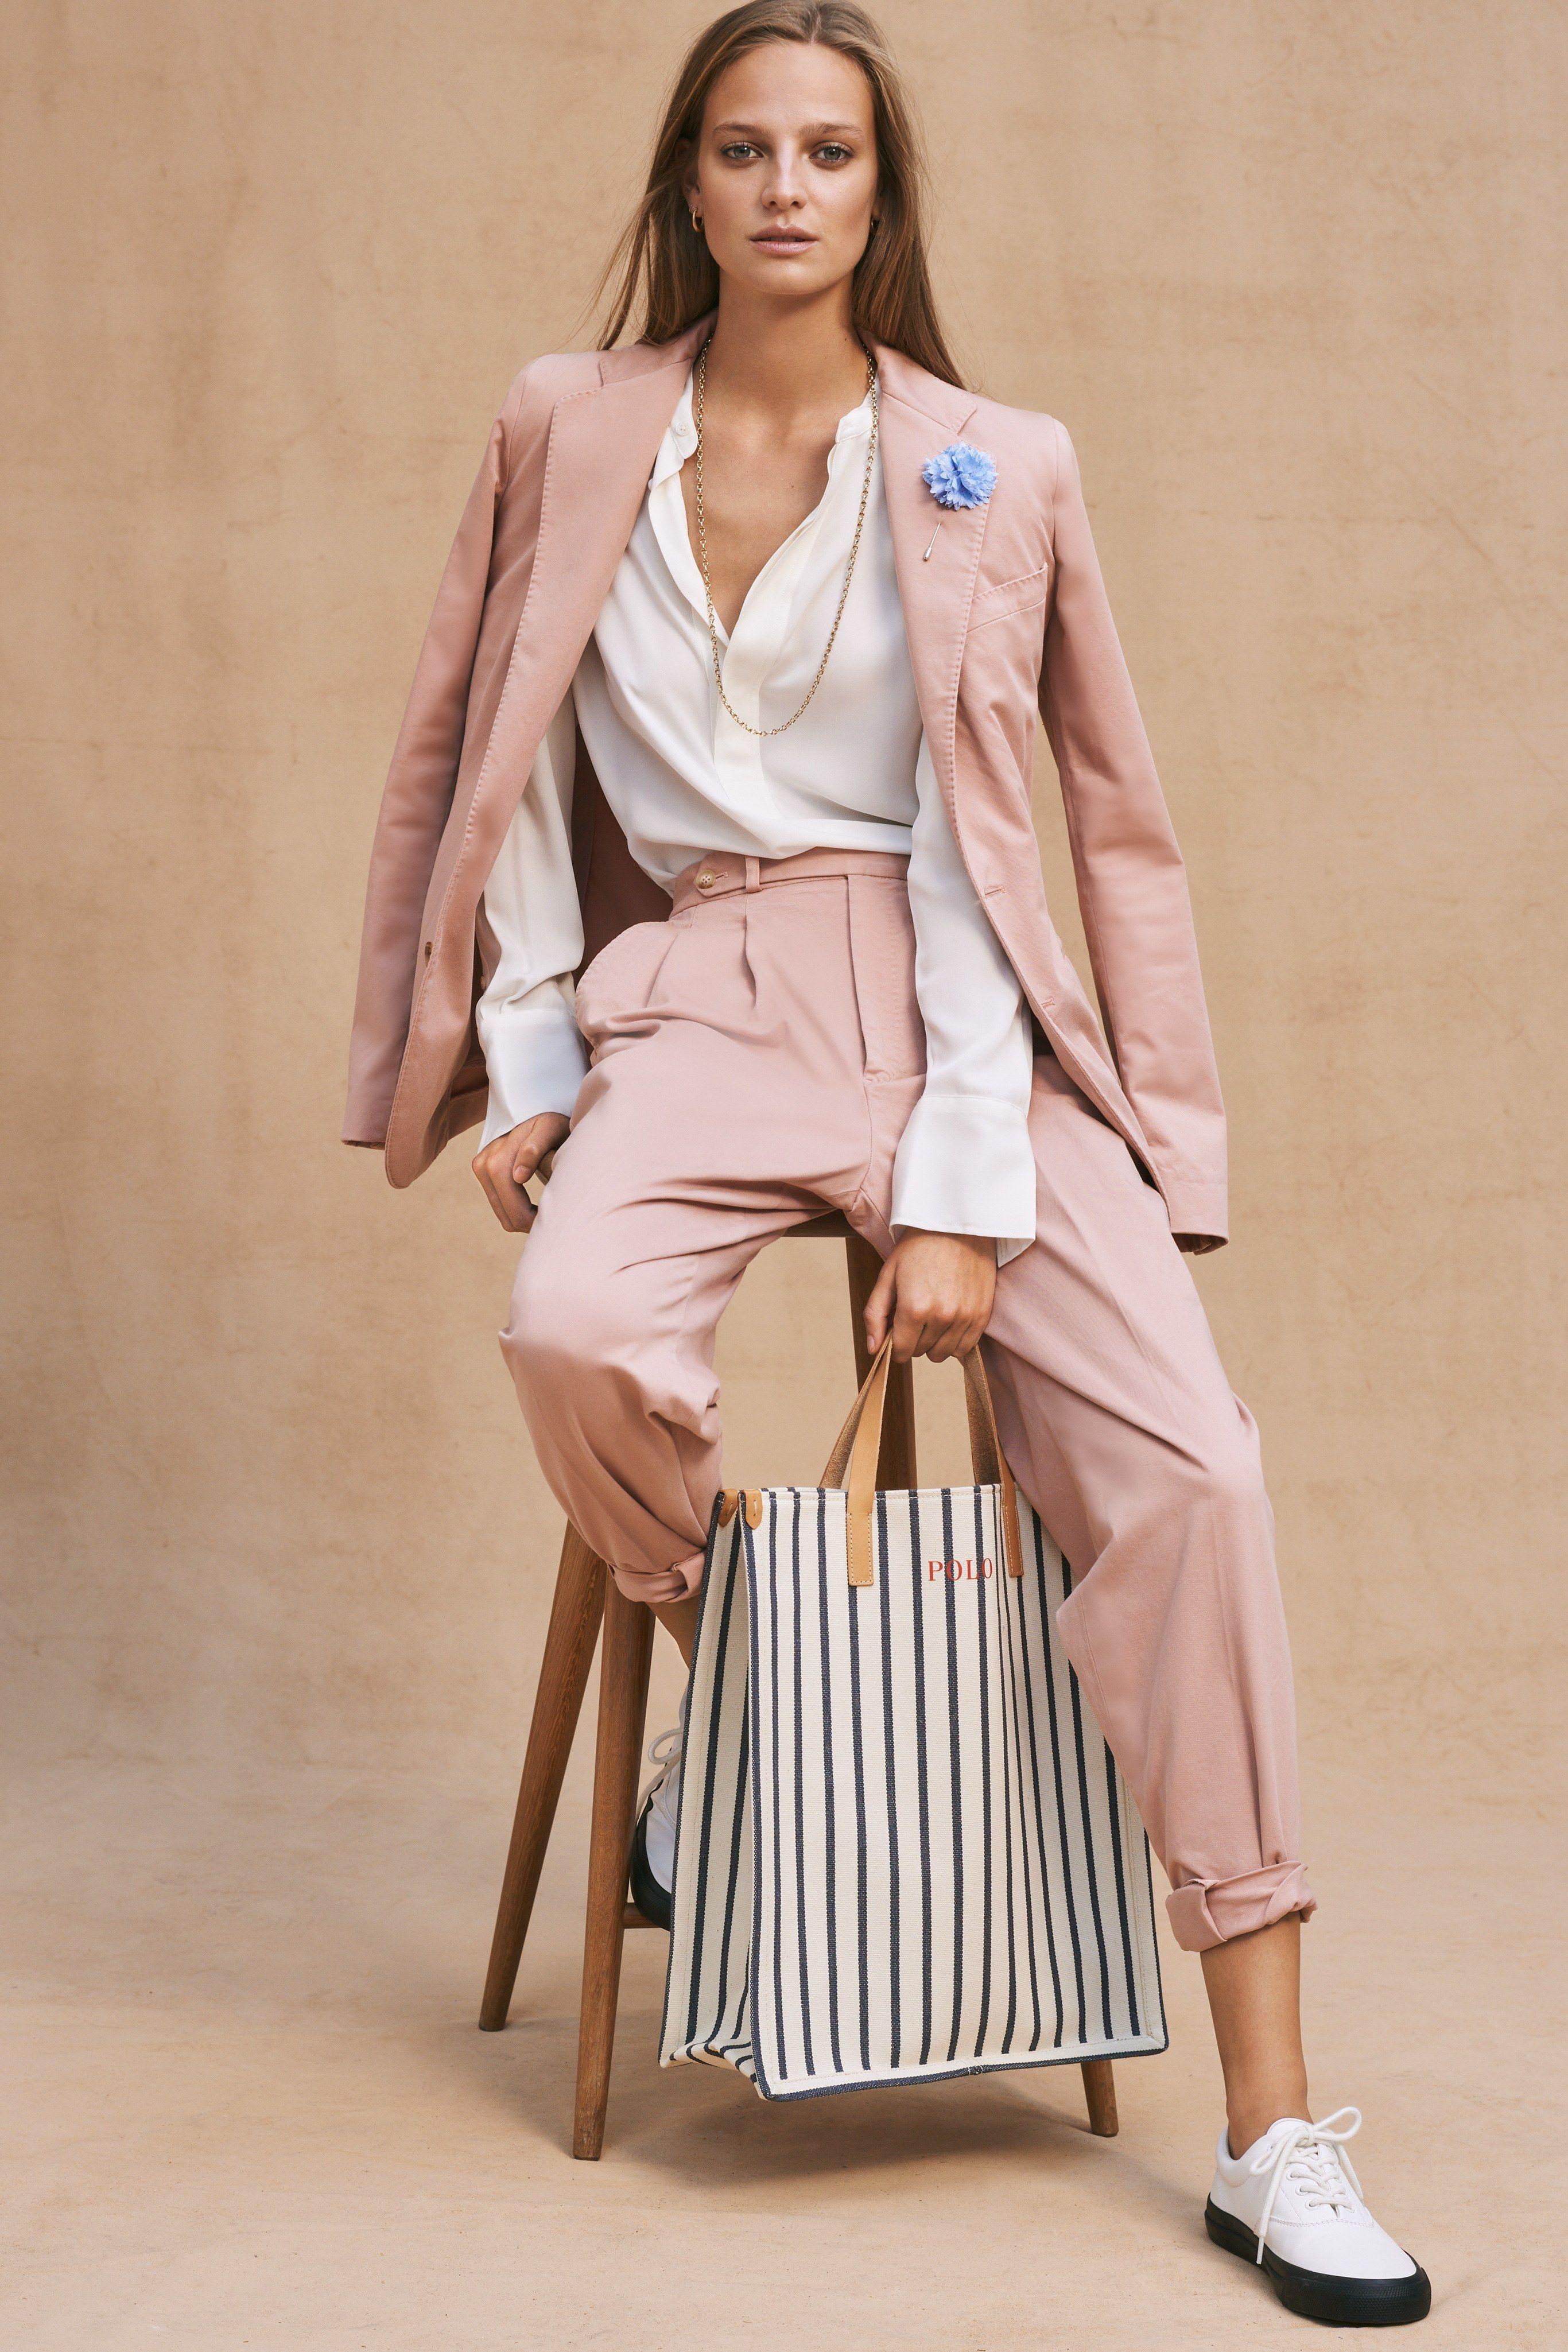 b7493bb30b89 Polo Ralph Lauren Spring 2019 Ready-to-Wear Fashion Show in 2019 ...